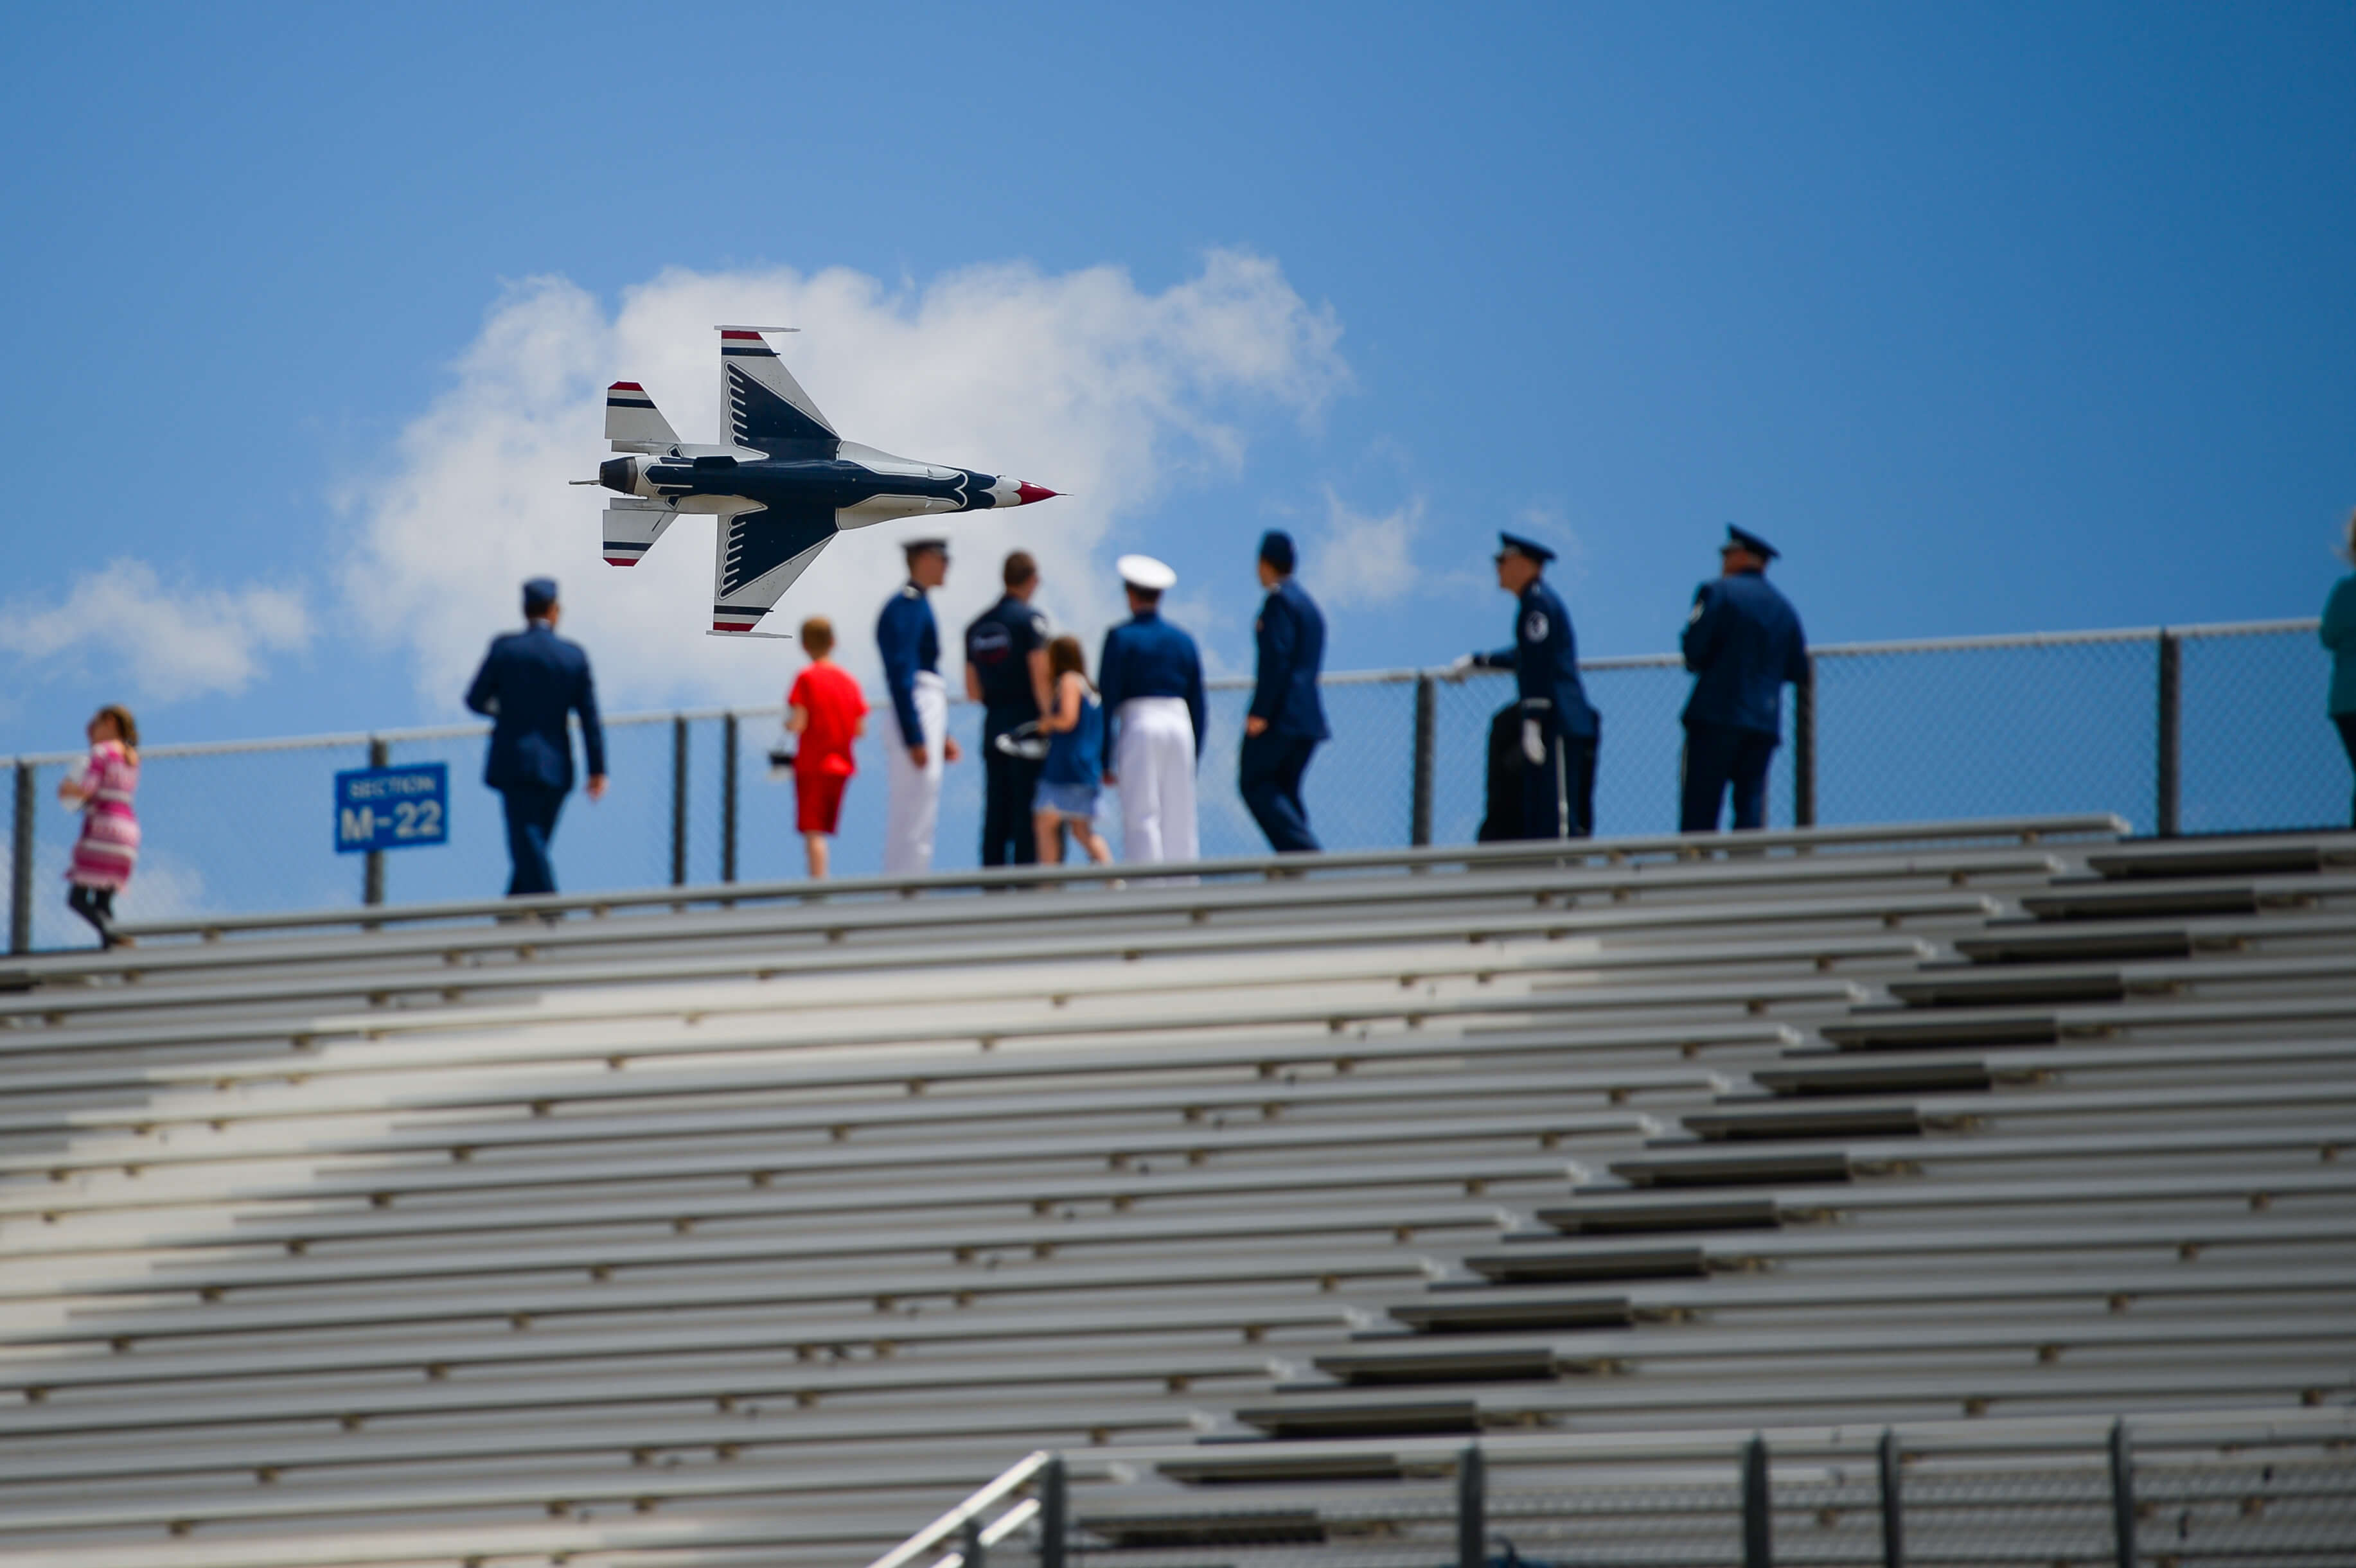 Thunderbirds Class of 2018 Graduation